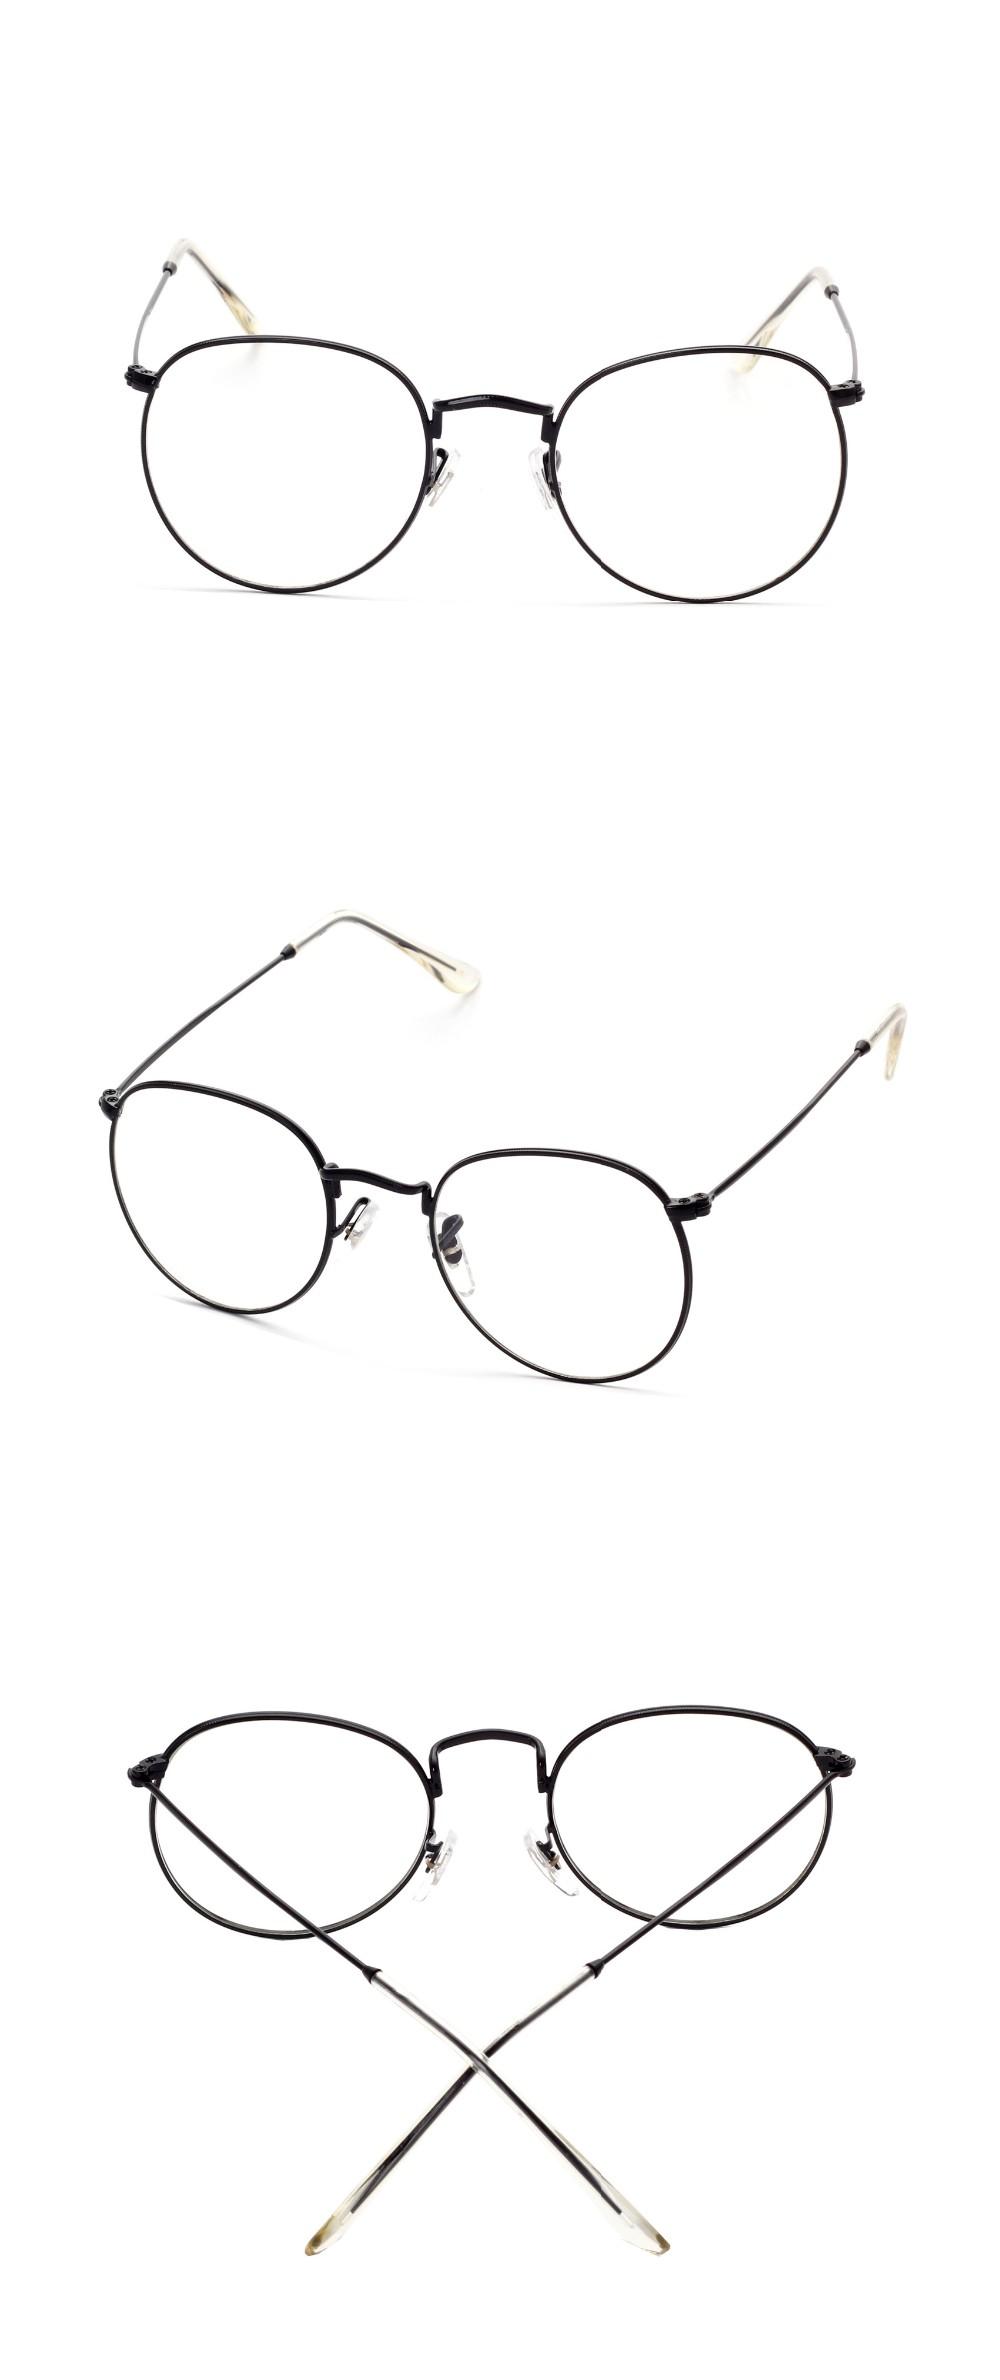 golden retro super light round wire frame eyeglasses antique Macy's Coupons Sunglasses 20150922 144517 052 20150922 144517 053 20150922 144517 058 20150922 144517 059 20150922 144517 060 20150922 144517 061 20150922 144517 062